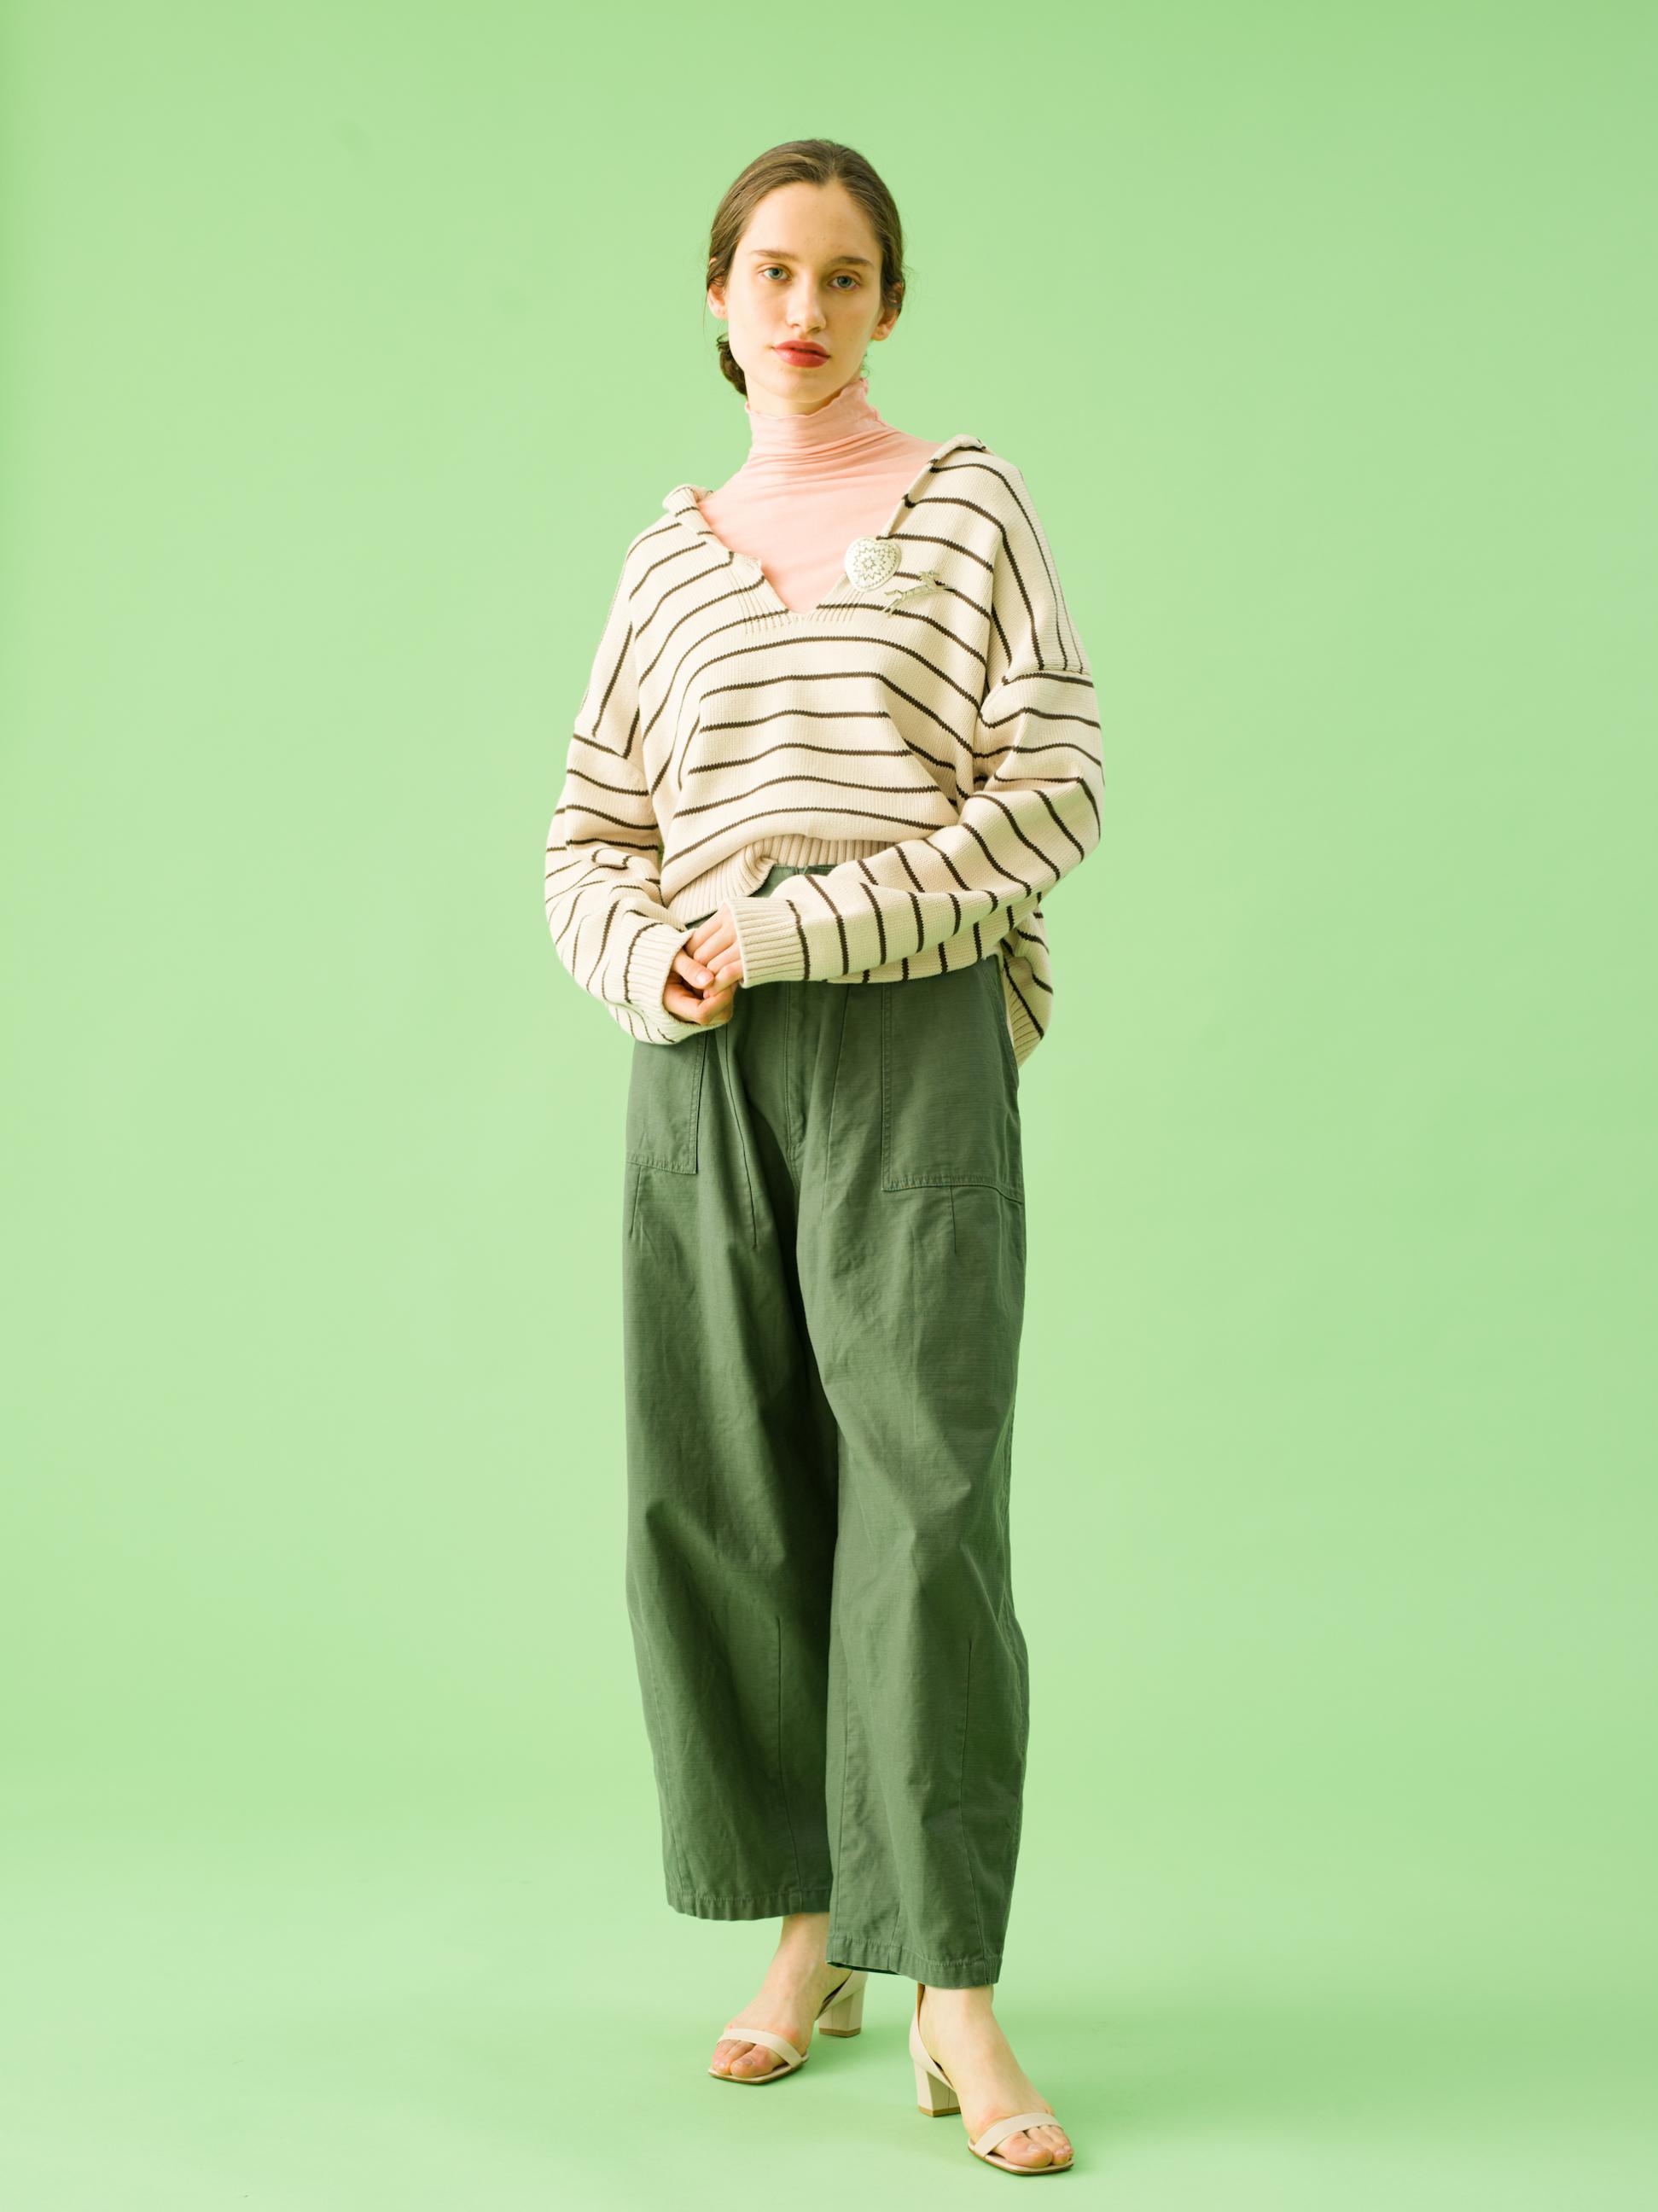 14_1 knit¥23,000 tops¥12,000 pants¥26,000 broache¥21,000 broache¥23,000 shoes¥29,000